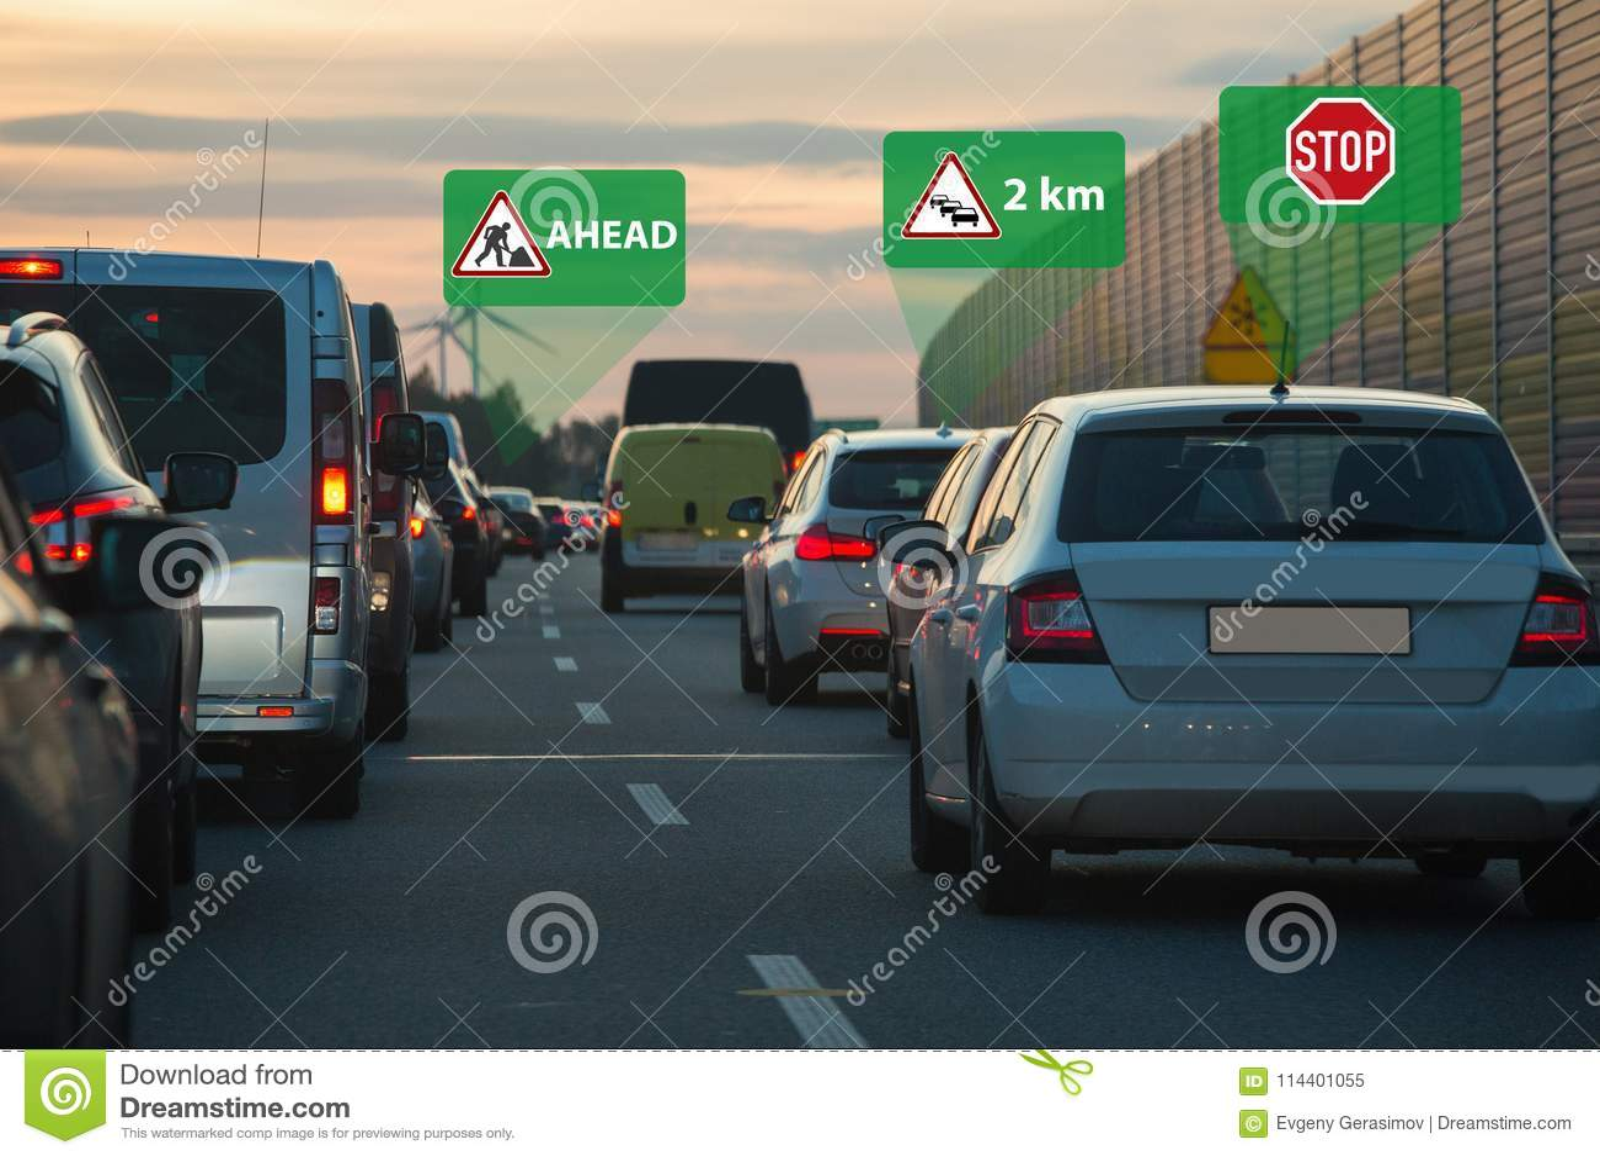 Voertuig aan voertuig mededeling